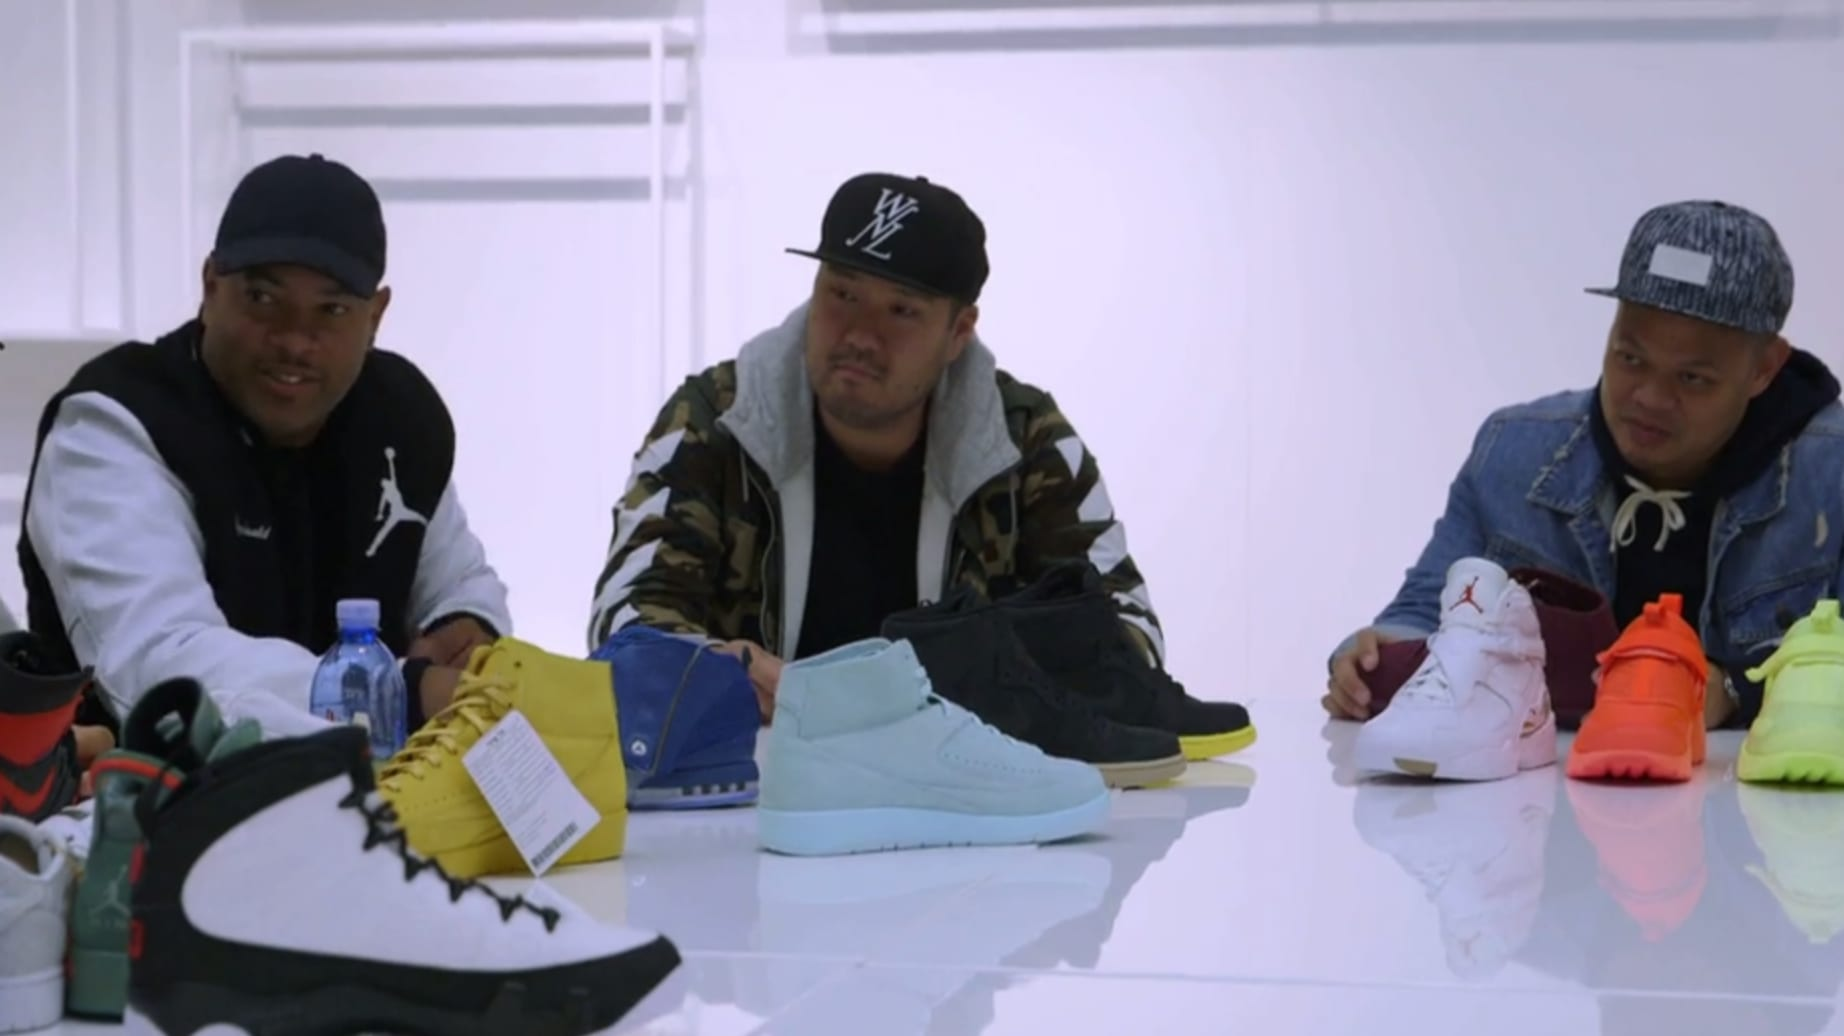 Unreleased Air Jordan Samples 3